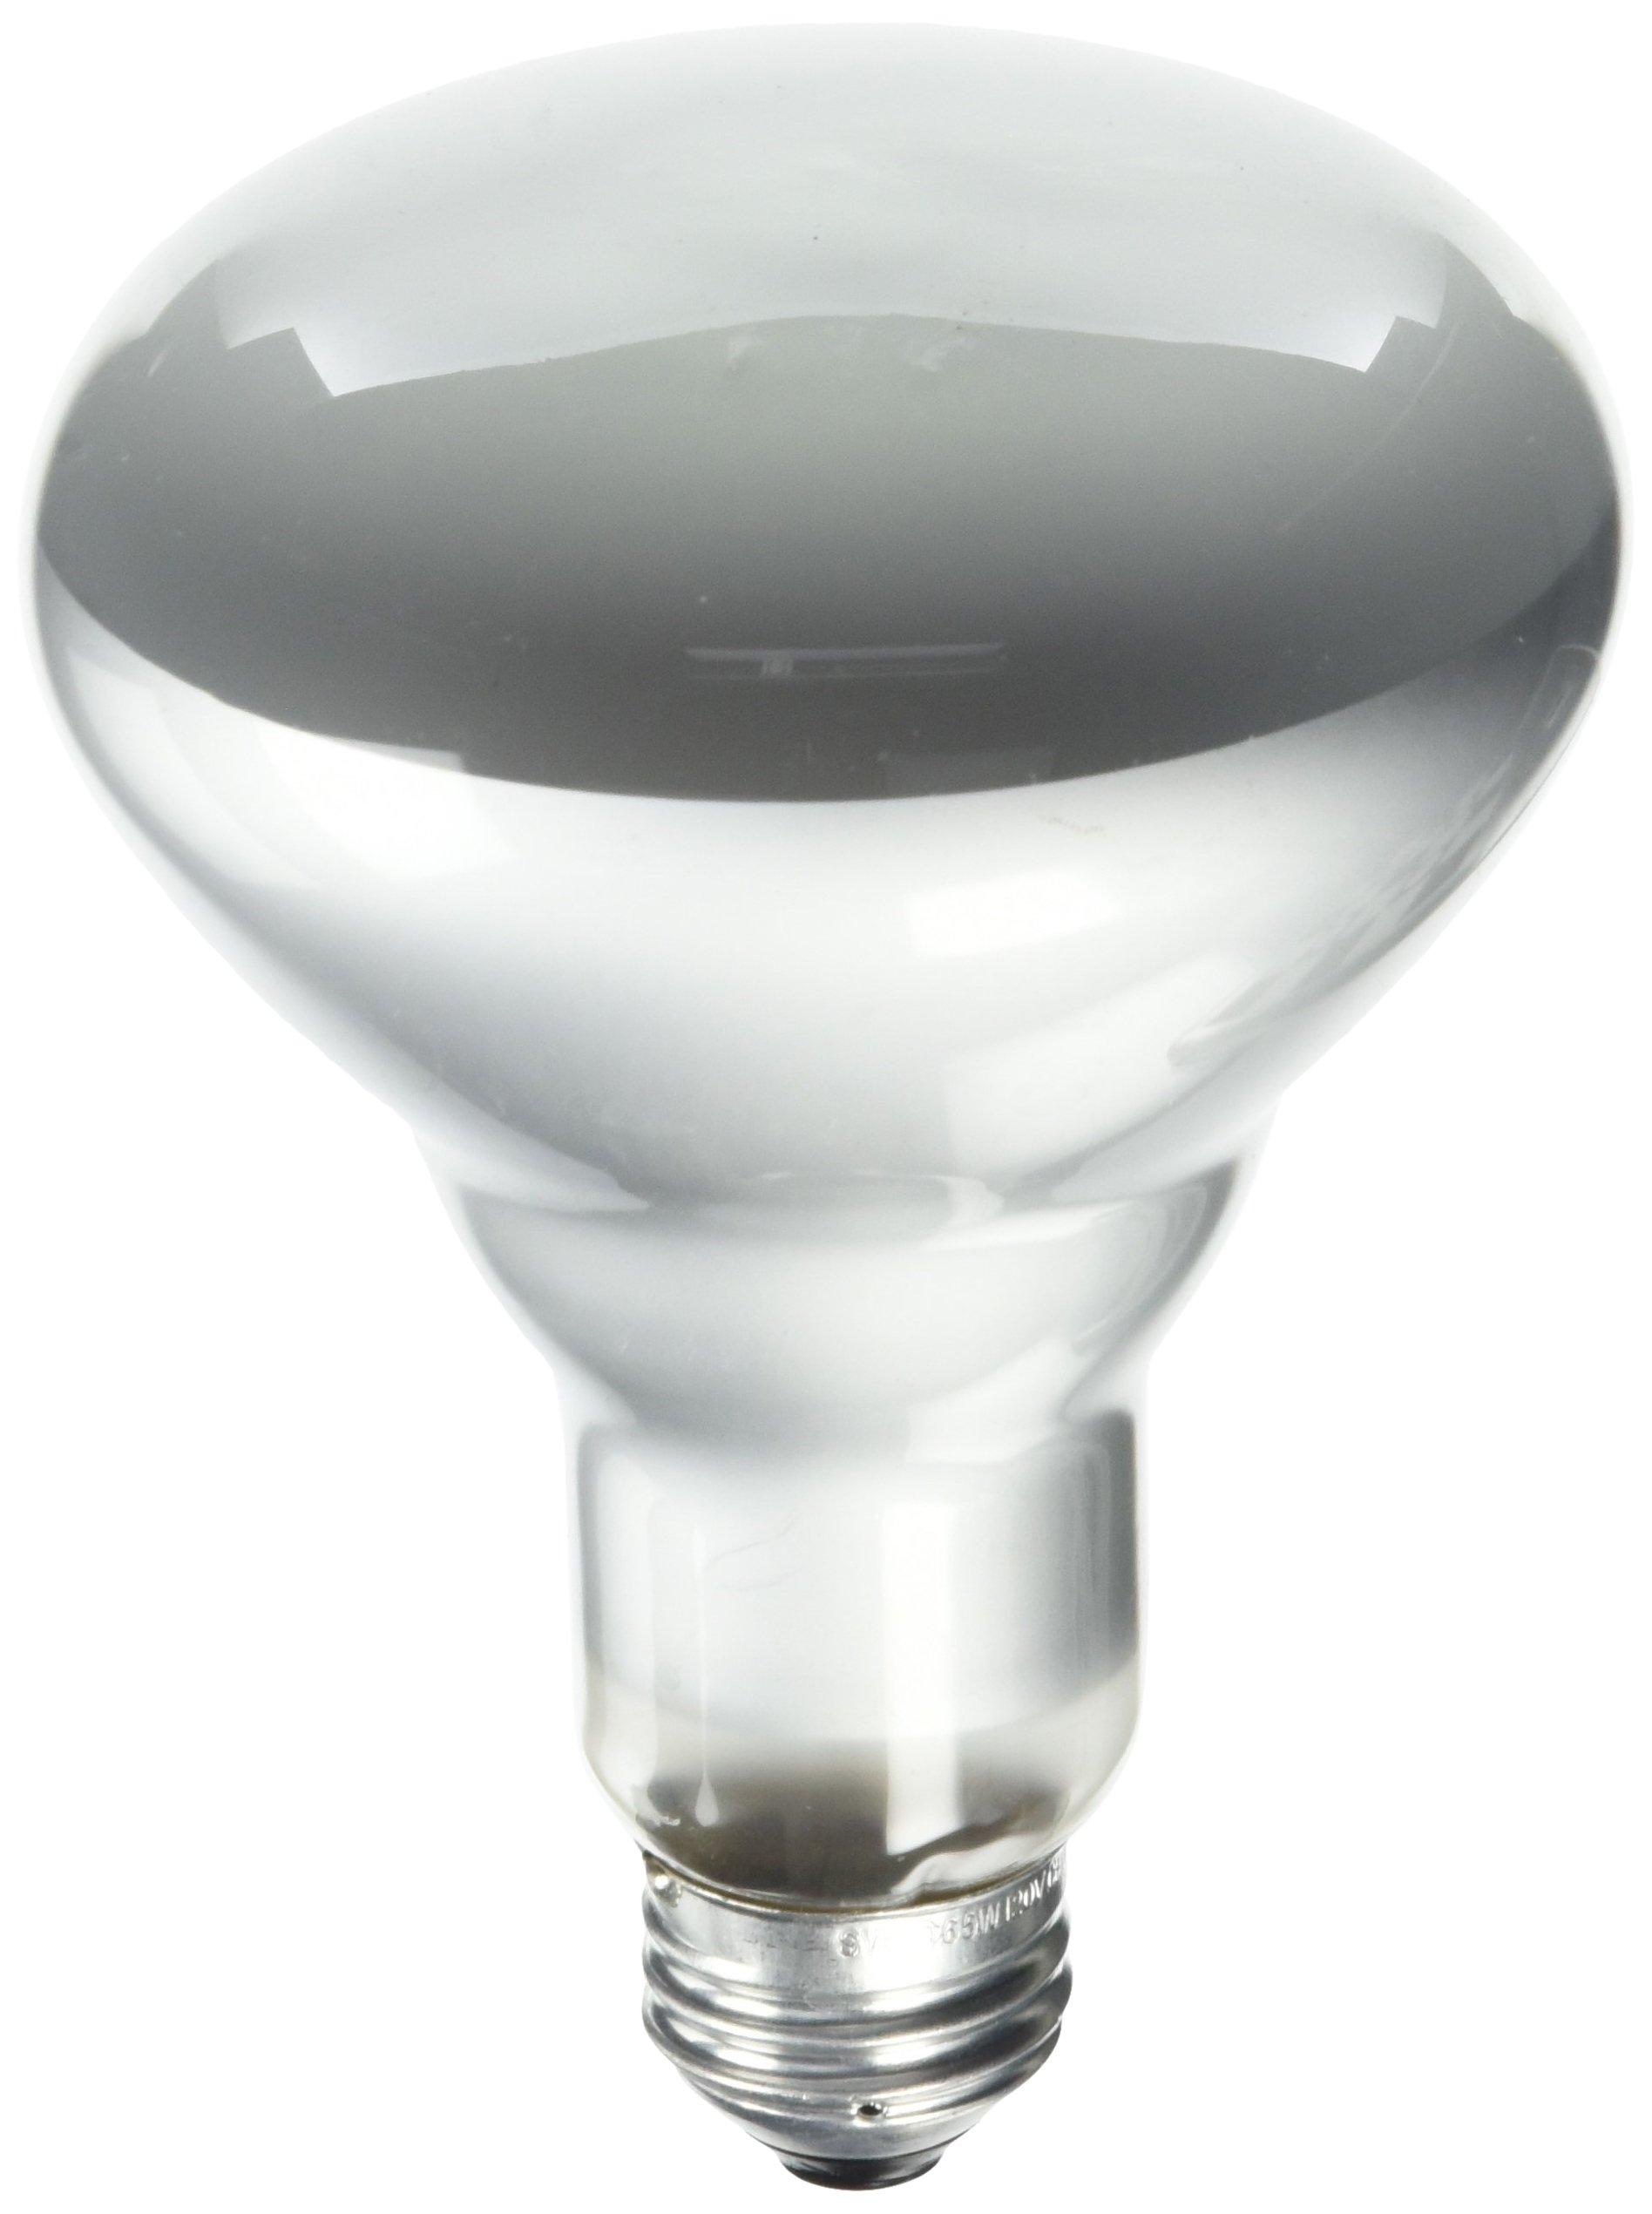 Sylvania 65 Watt BR30 Flood Light Bulbs 9-Pack